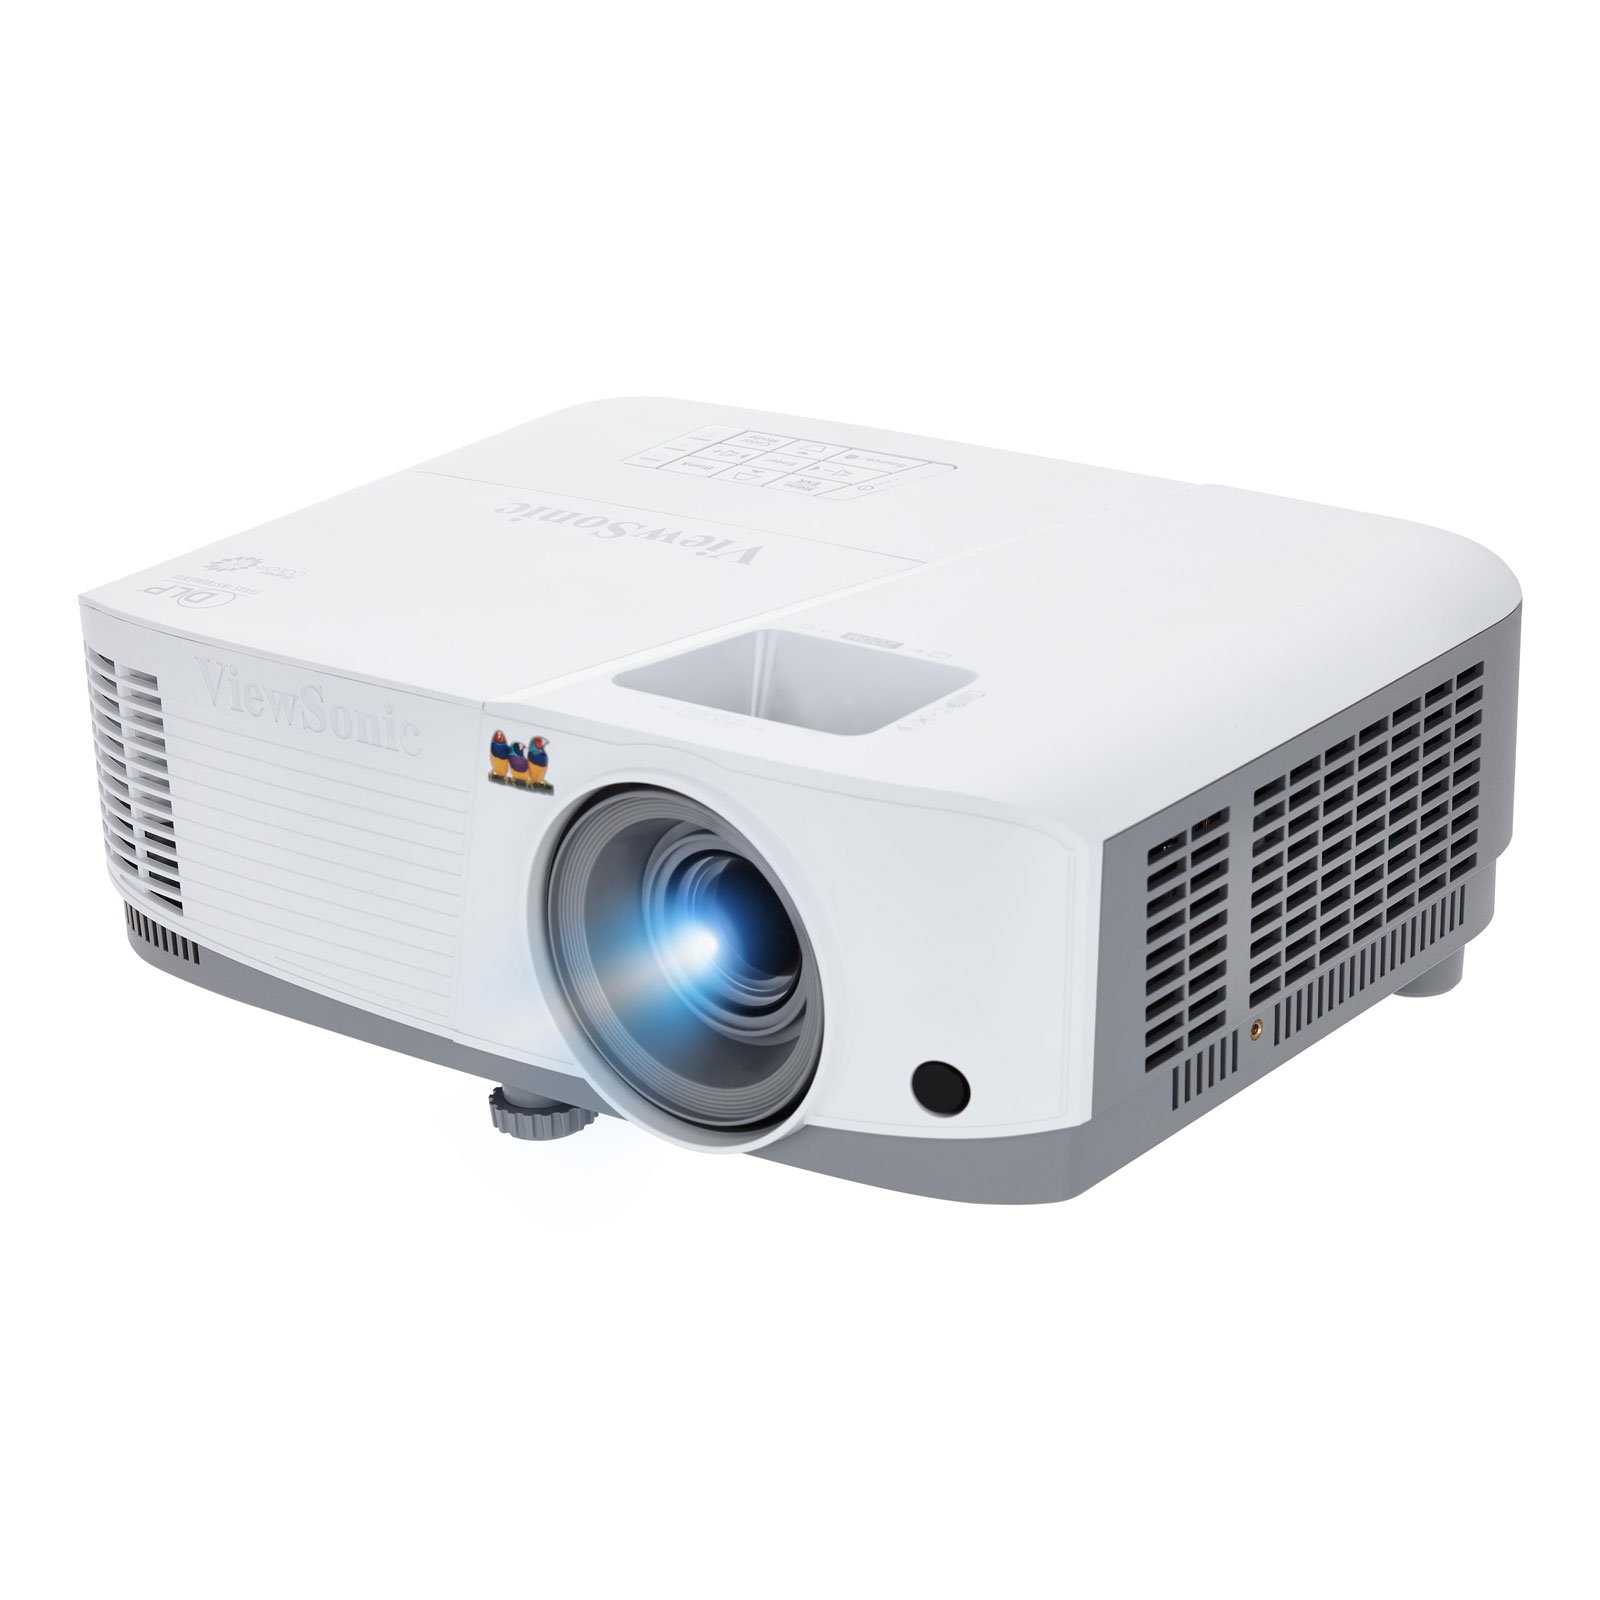 ViewSonic PA503S - Vidéoprojecteur ViewSonic - Cybertek.fr - 3